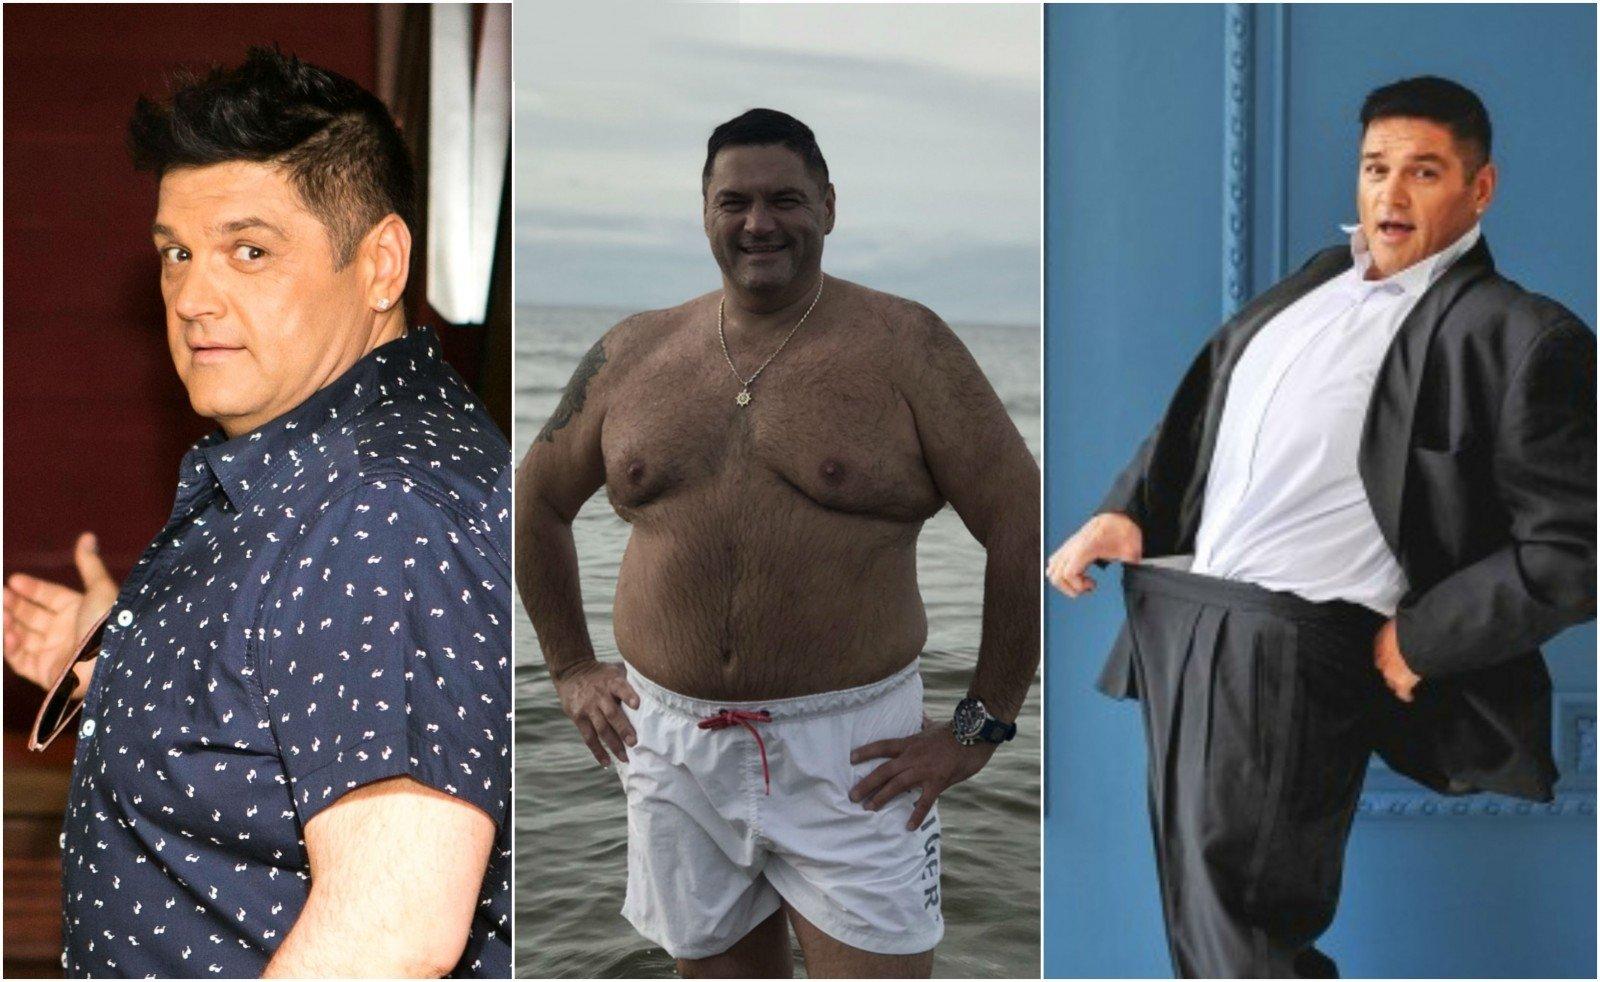 7 kg svorio per 1 savaitę